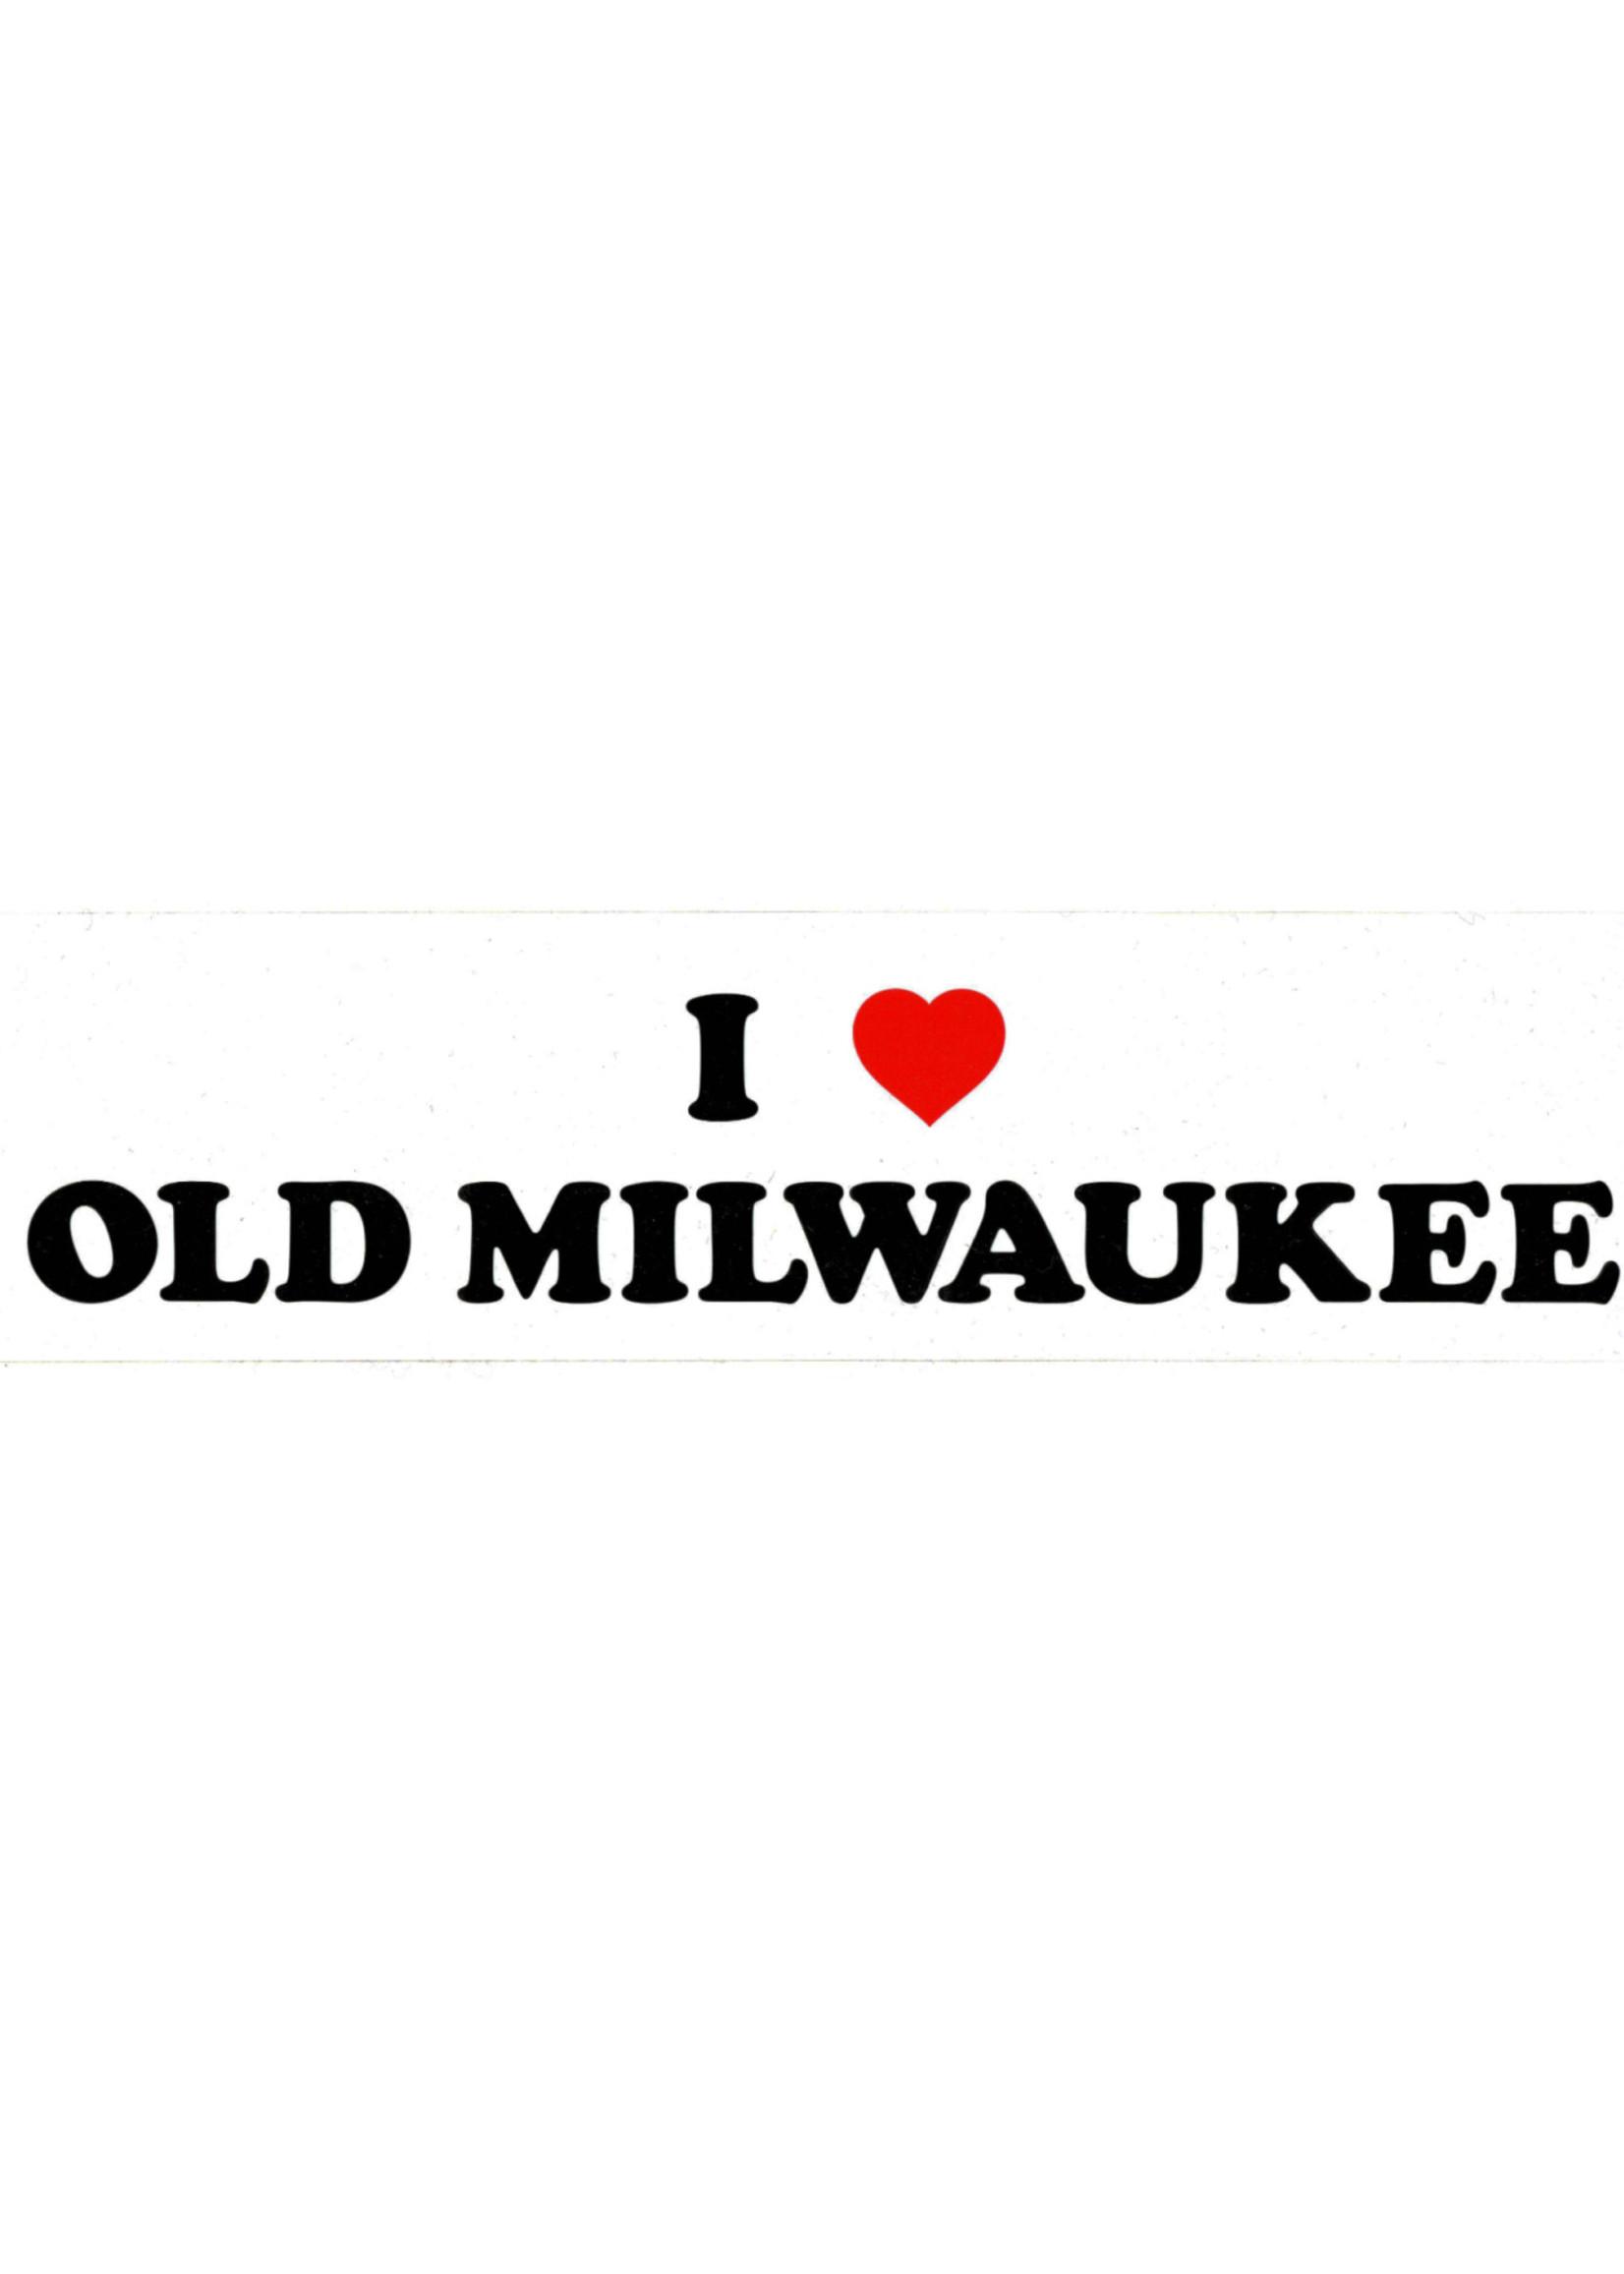 Old Milwaukee Old Milwaukee Bumper Sticker